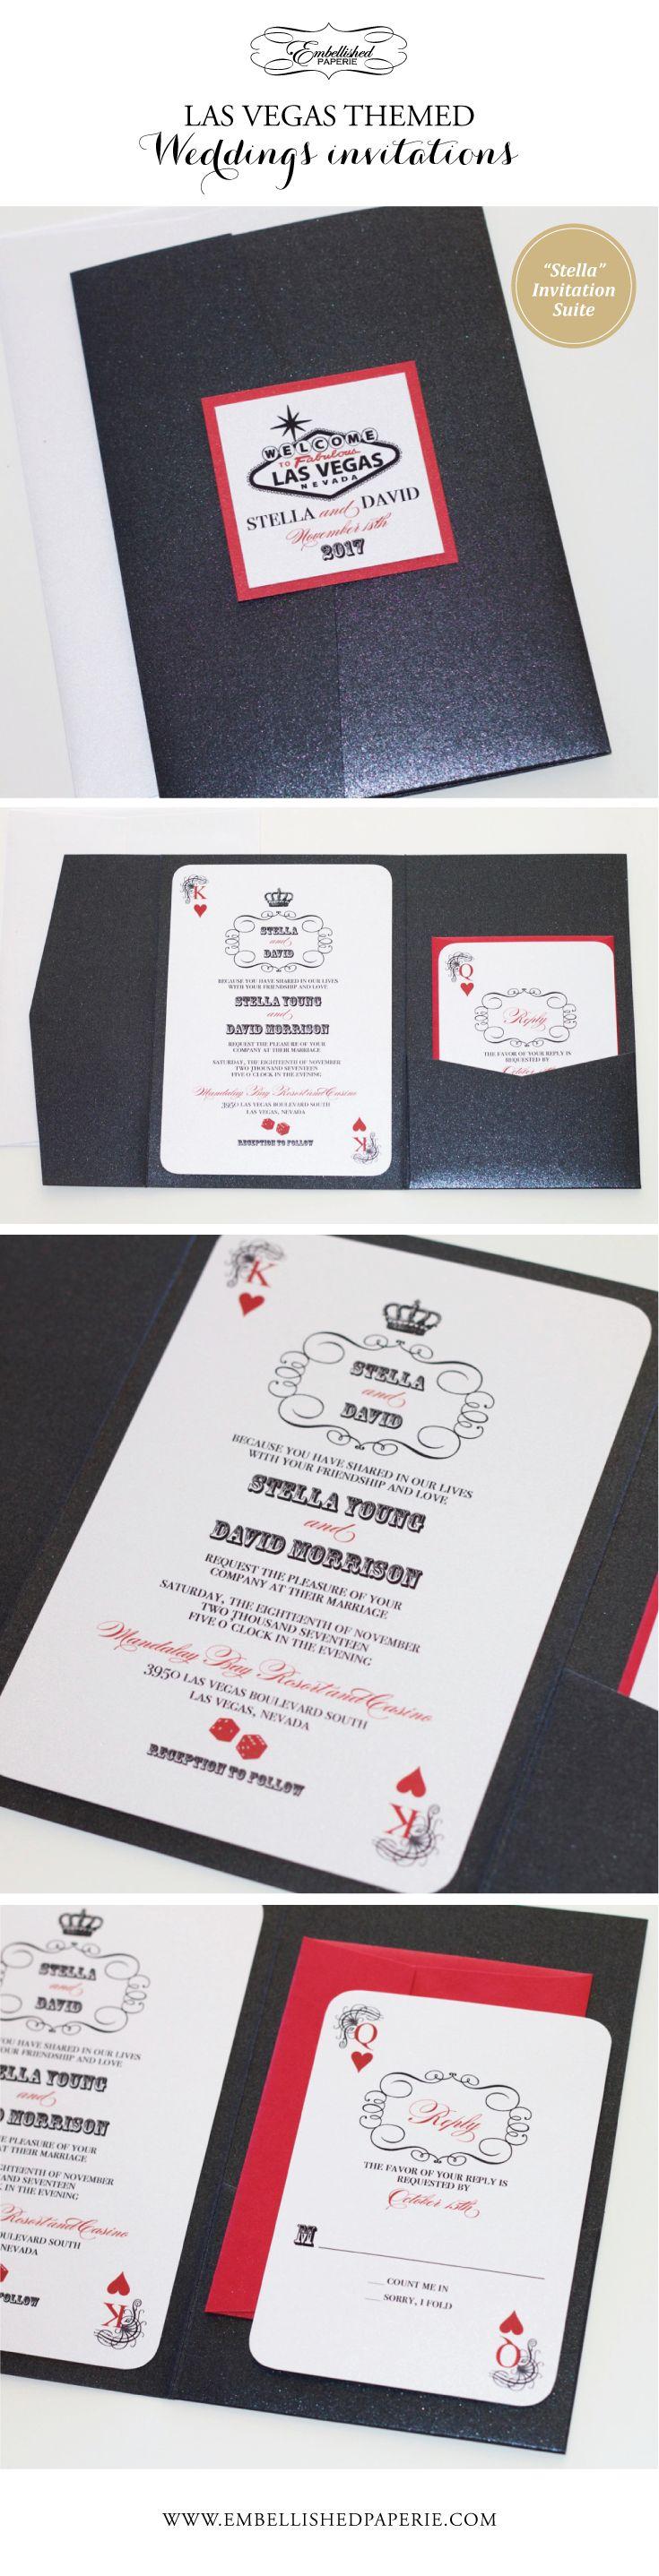 vegas wedding invitations las vegas wedding invitations Las Vegas Wedding Invitation Perfect for a Las Vegas Wedding or Casino Themed Party